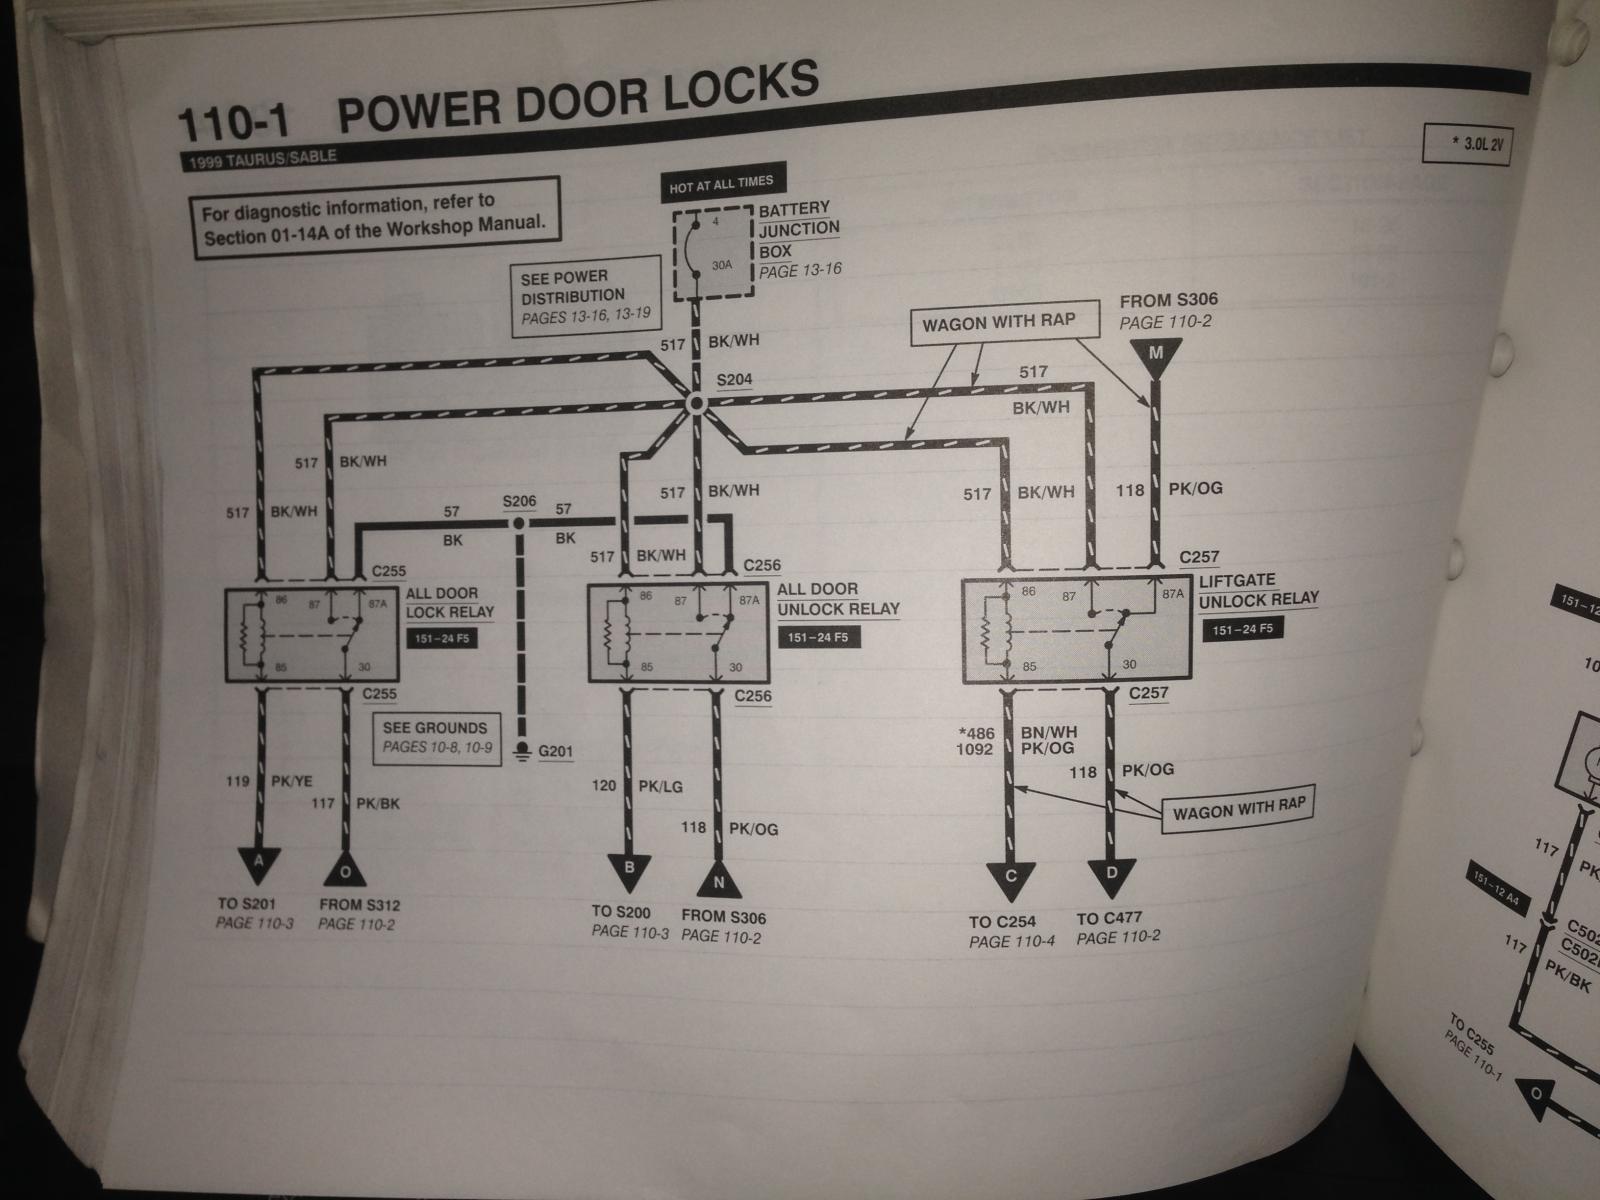 avital remote start wiring diagram 2001 taurus wiring diagram option wrg 4838 avital remote start wiring diagram 2001 taurus avital remote start wiring diagram 2001